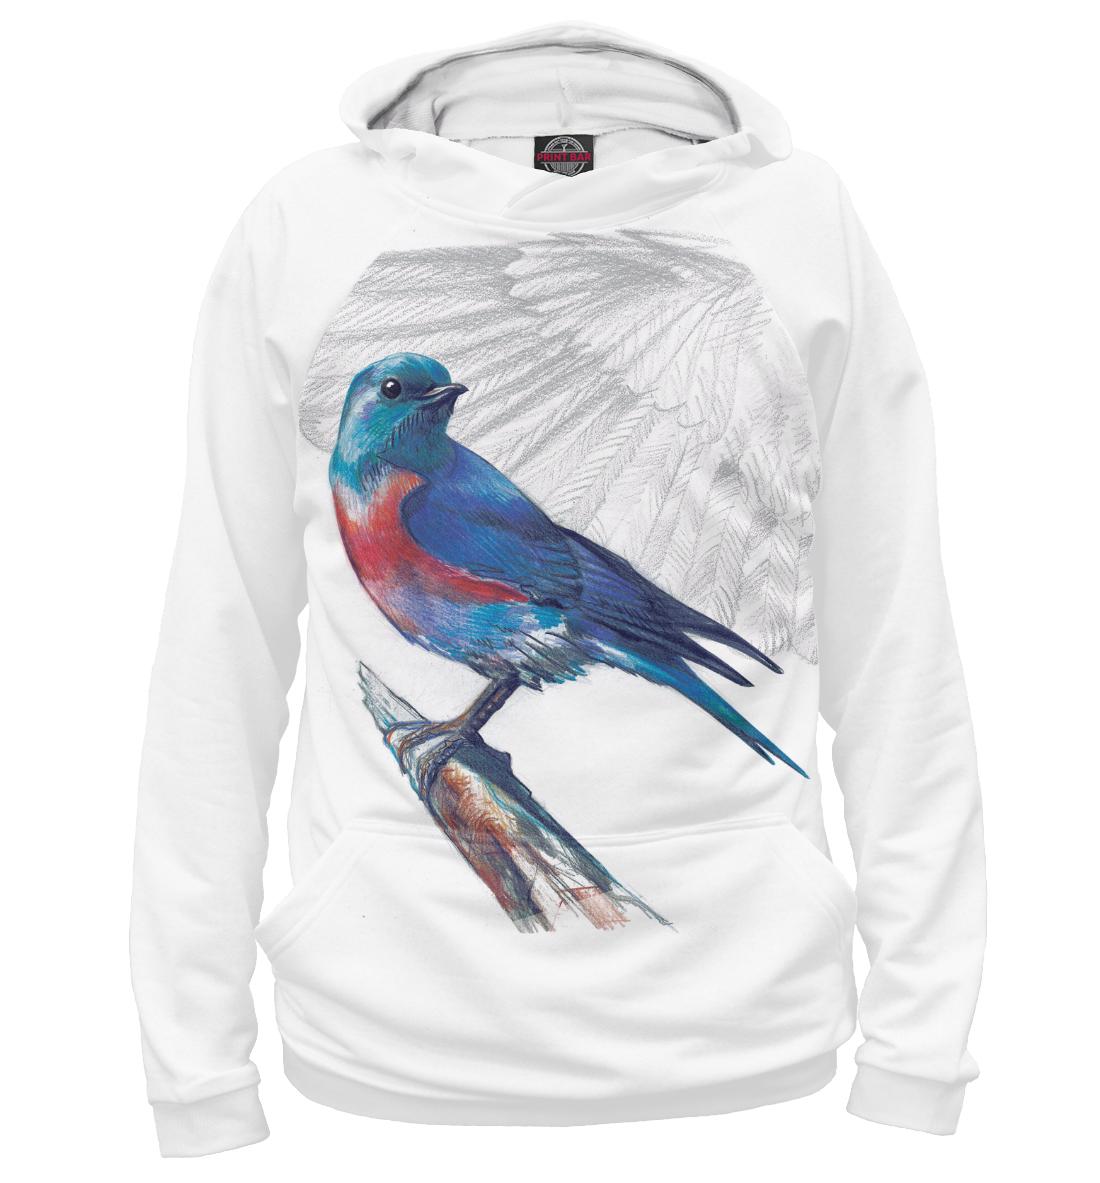 Купить Синяя Птица, Printbar, Худи, PTI-976110-hud-2